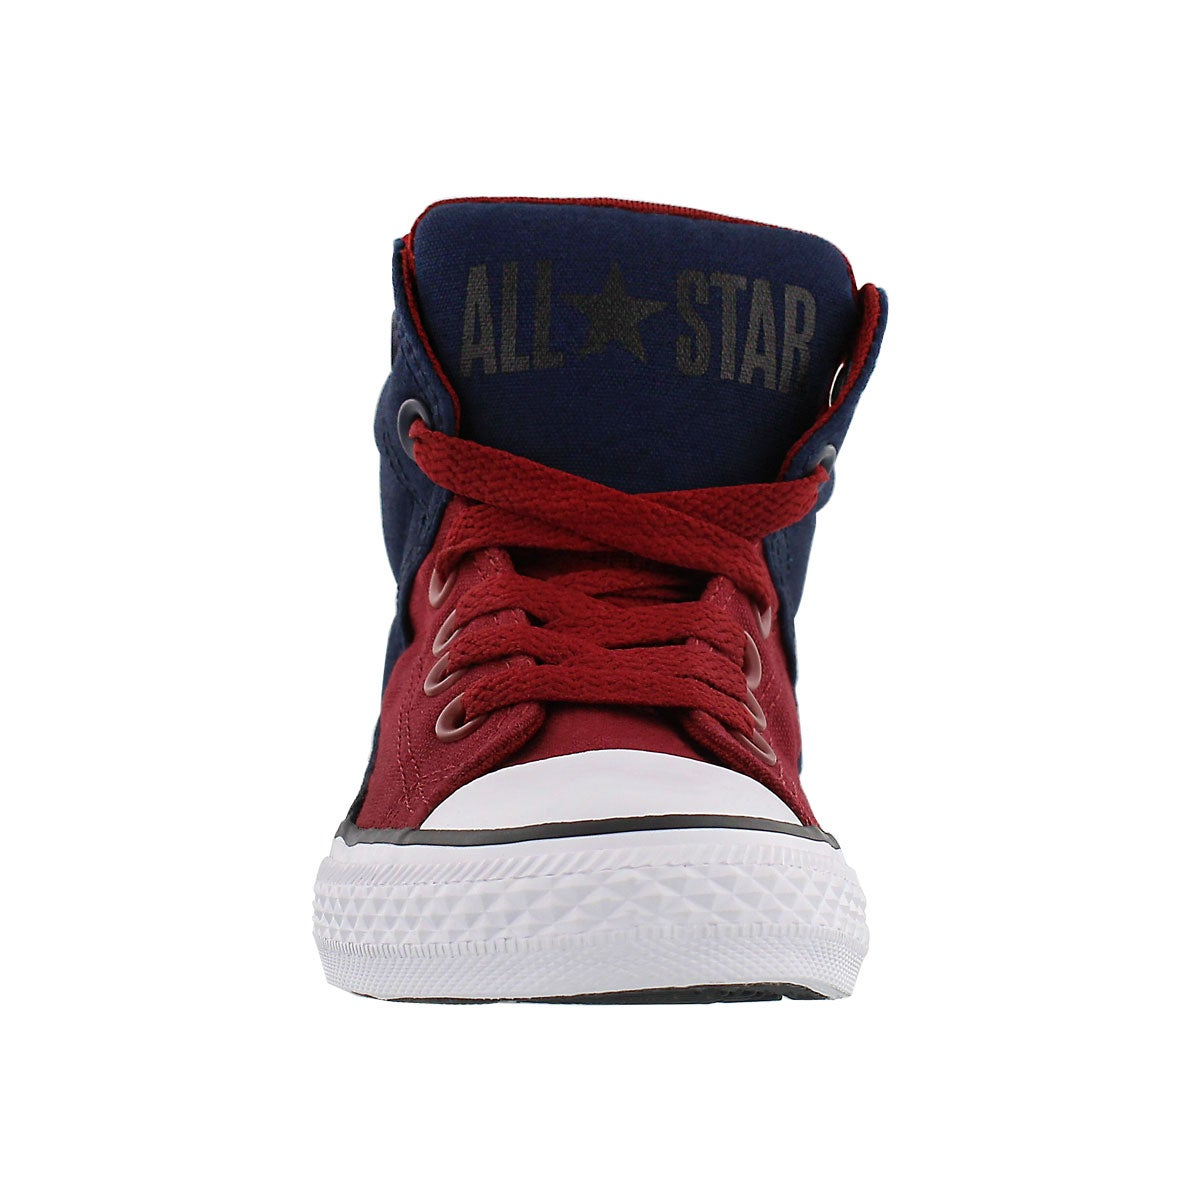 Bys HighStreetHi obsidian/red sneaker